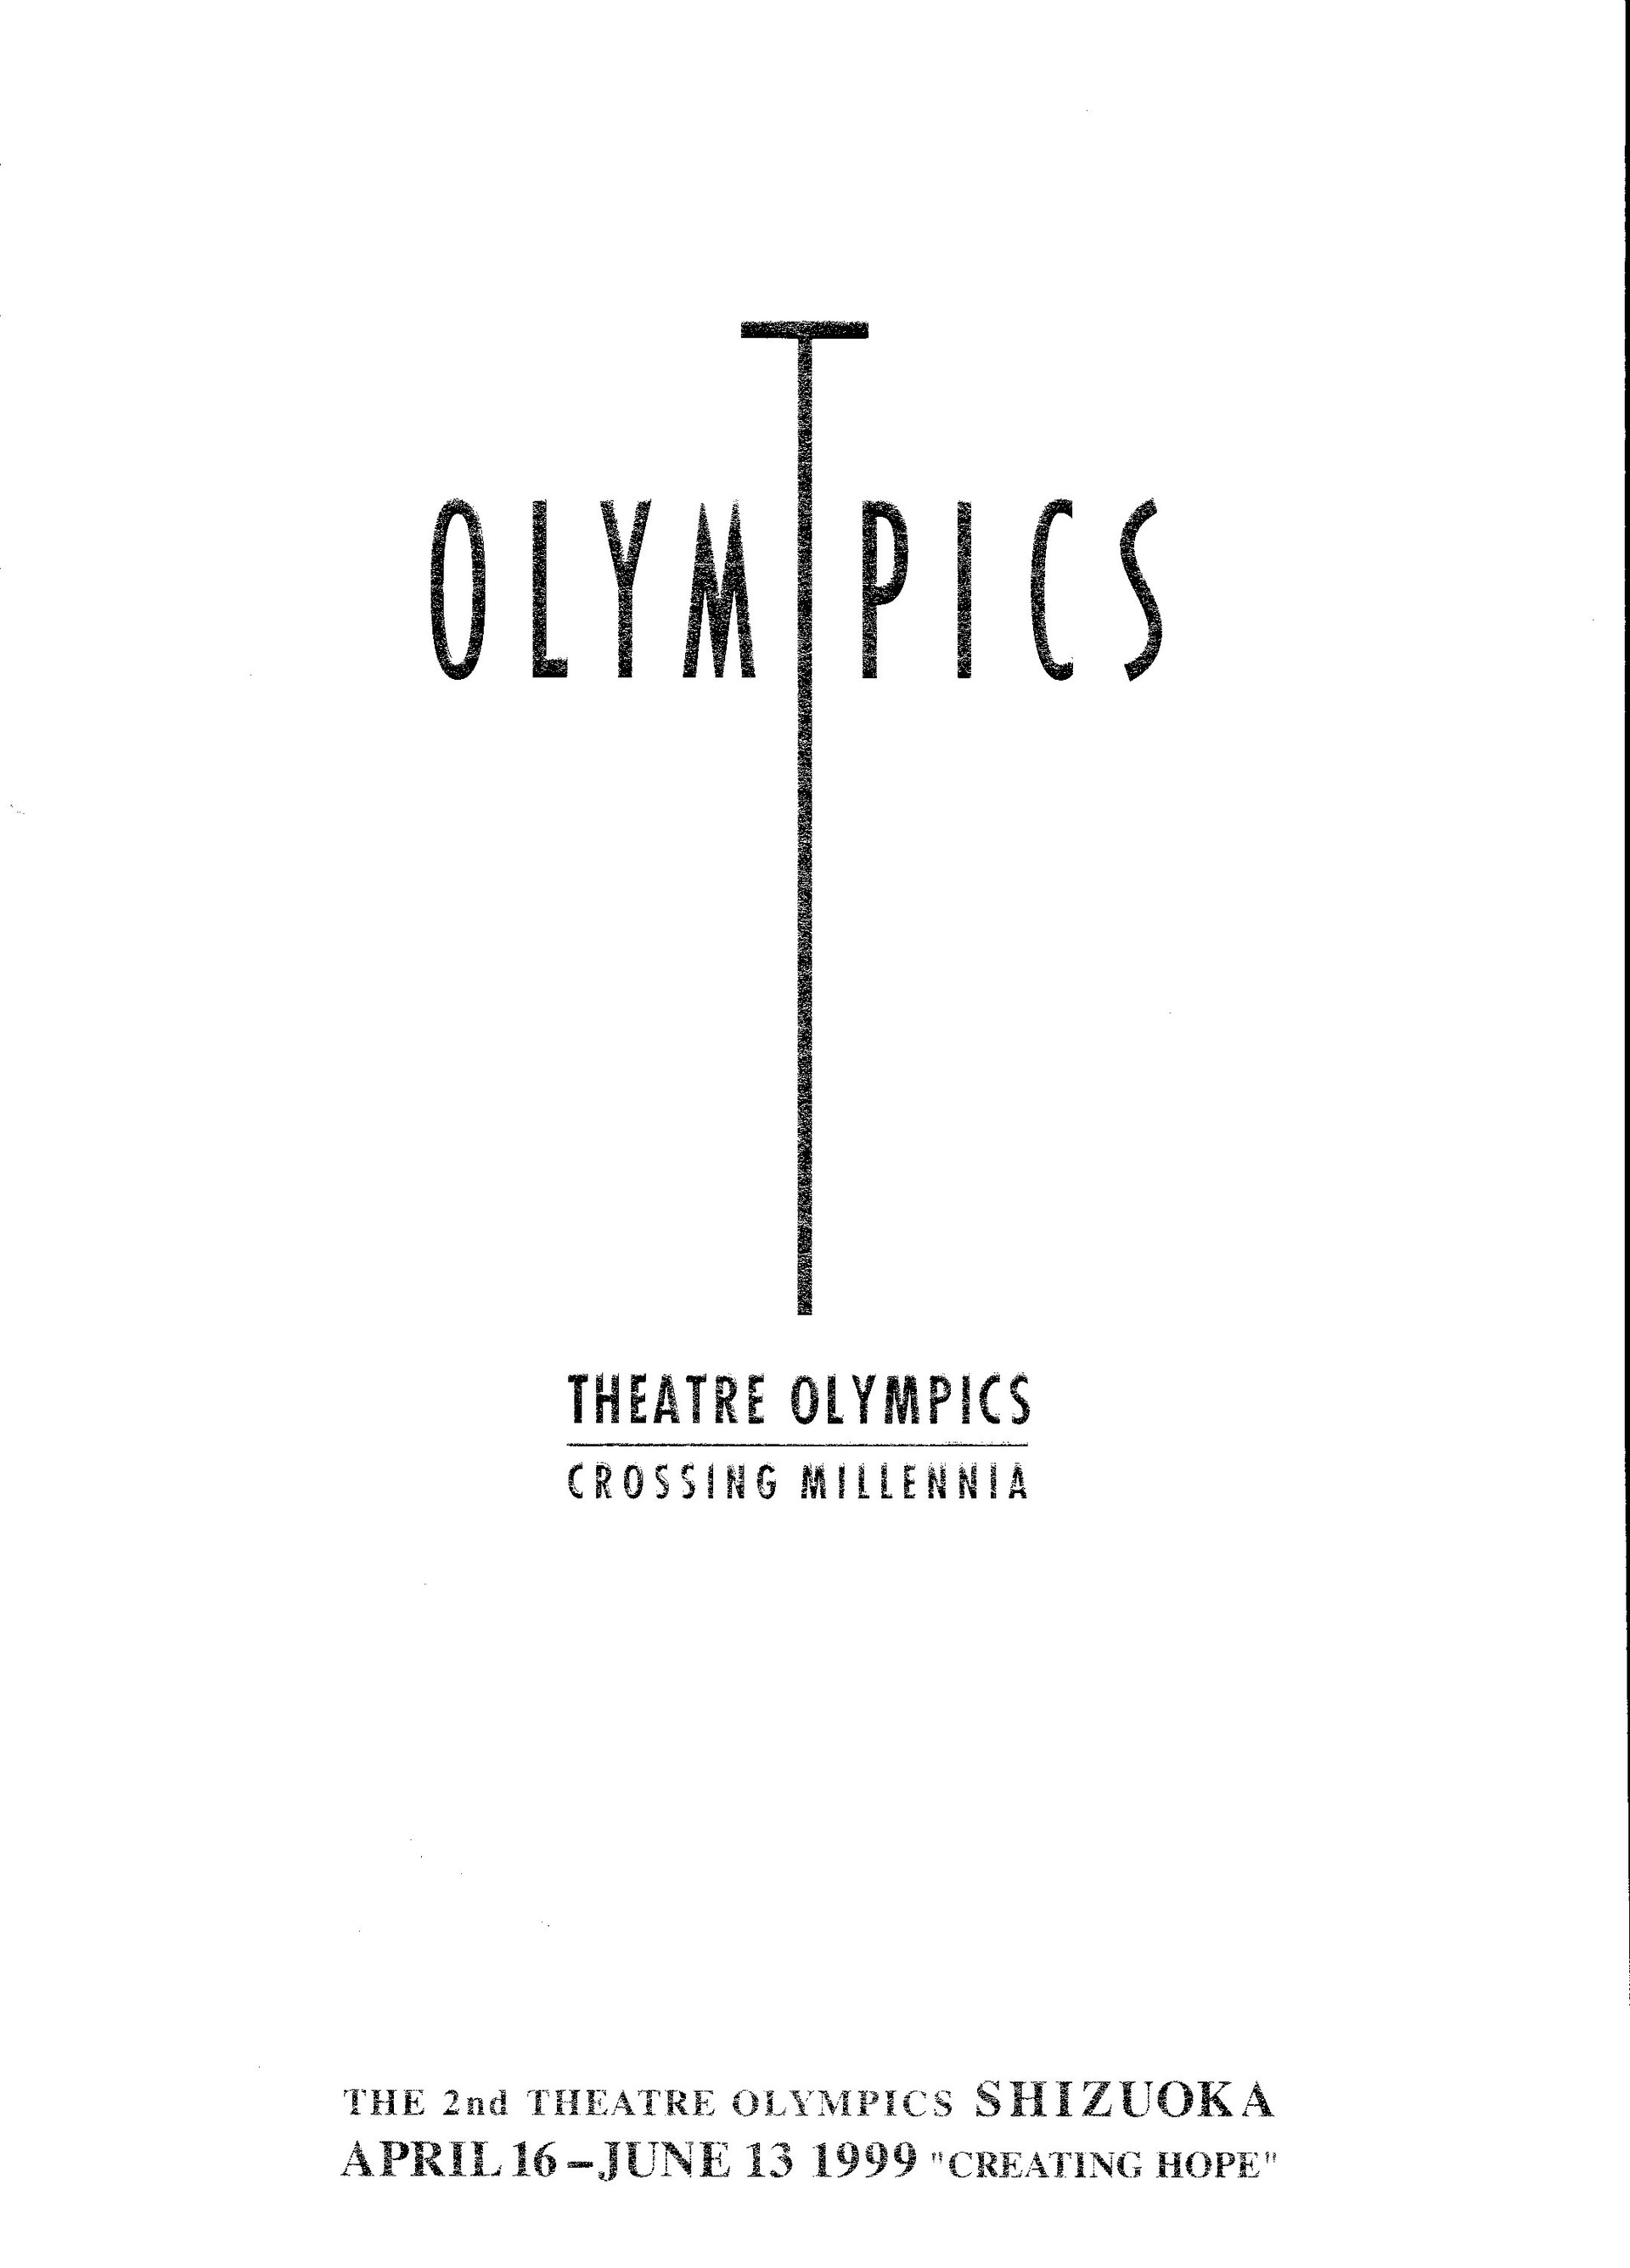 1999 Theatre Olympics Japan.jpg